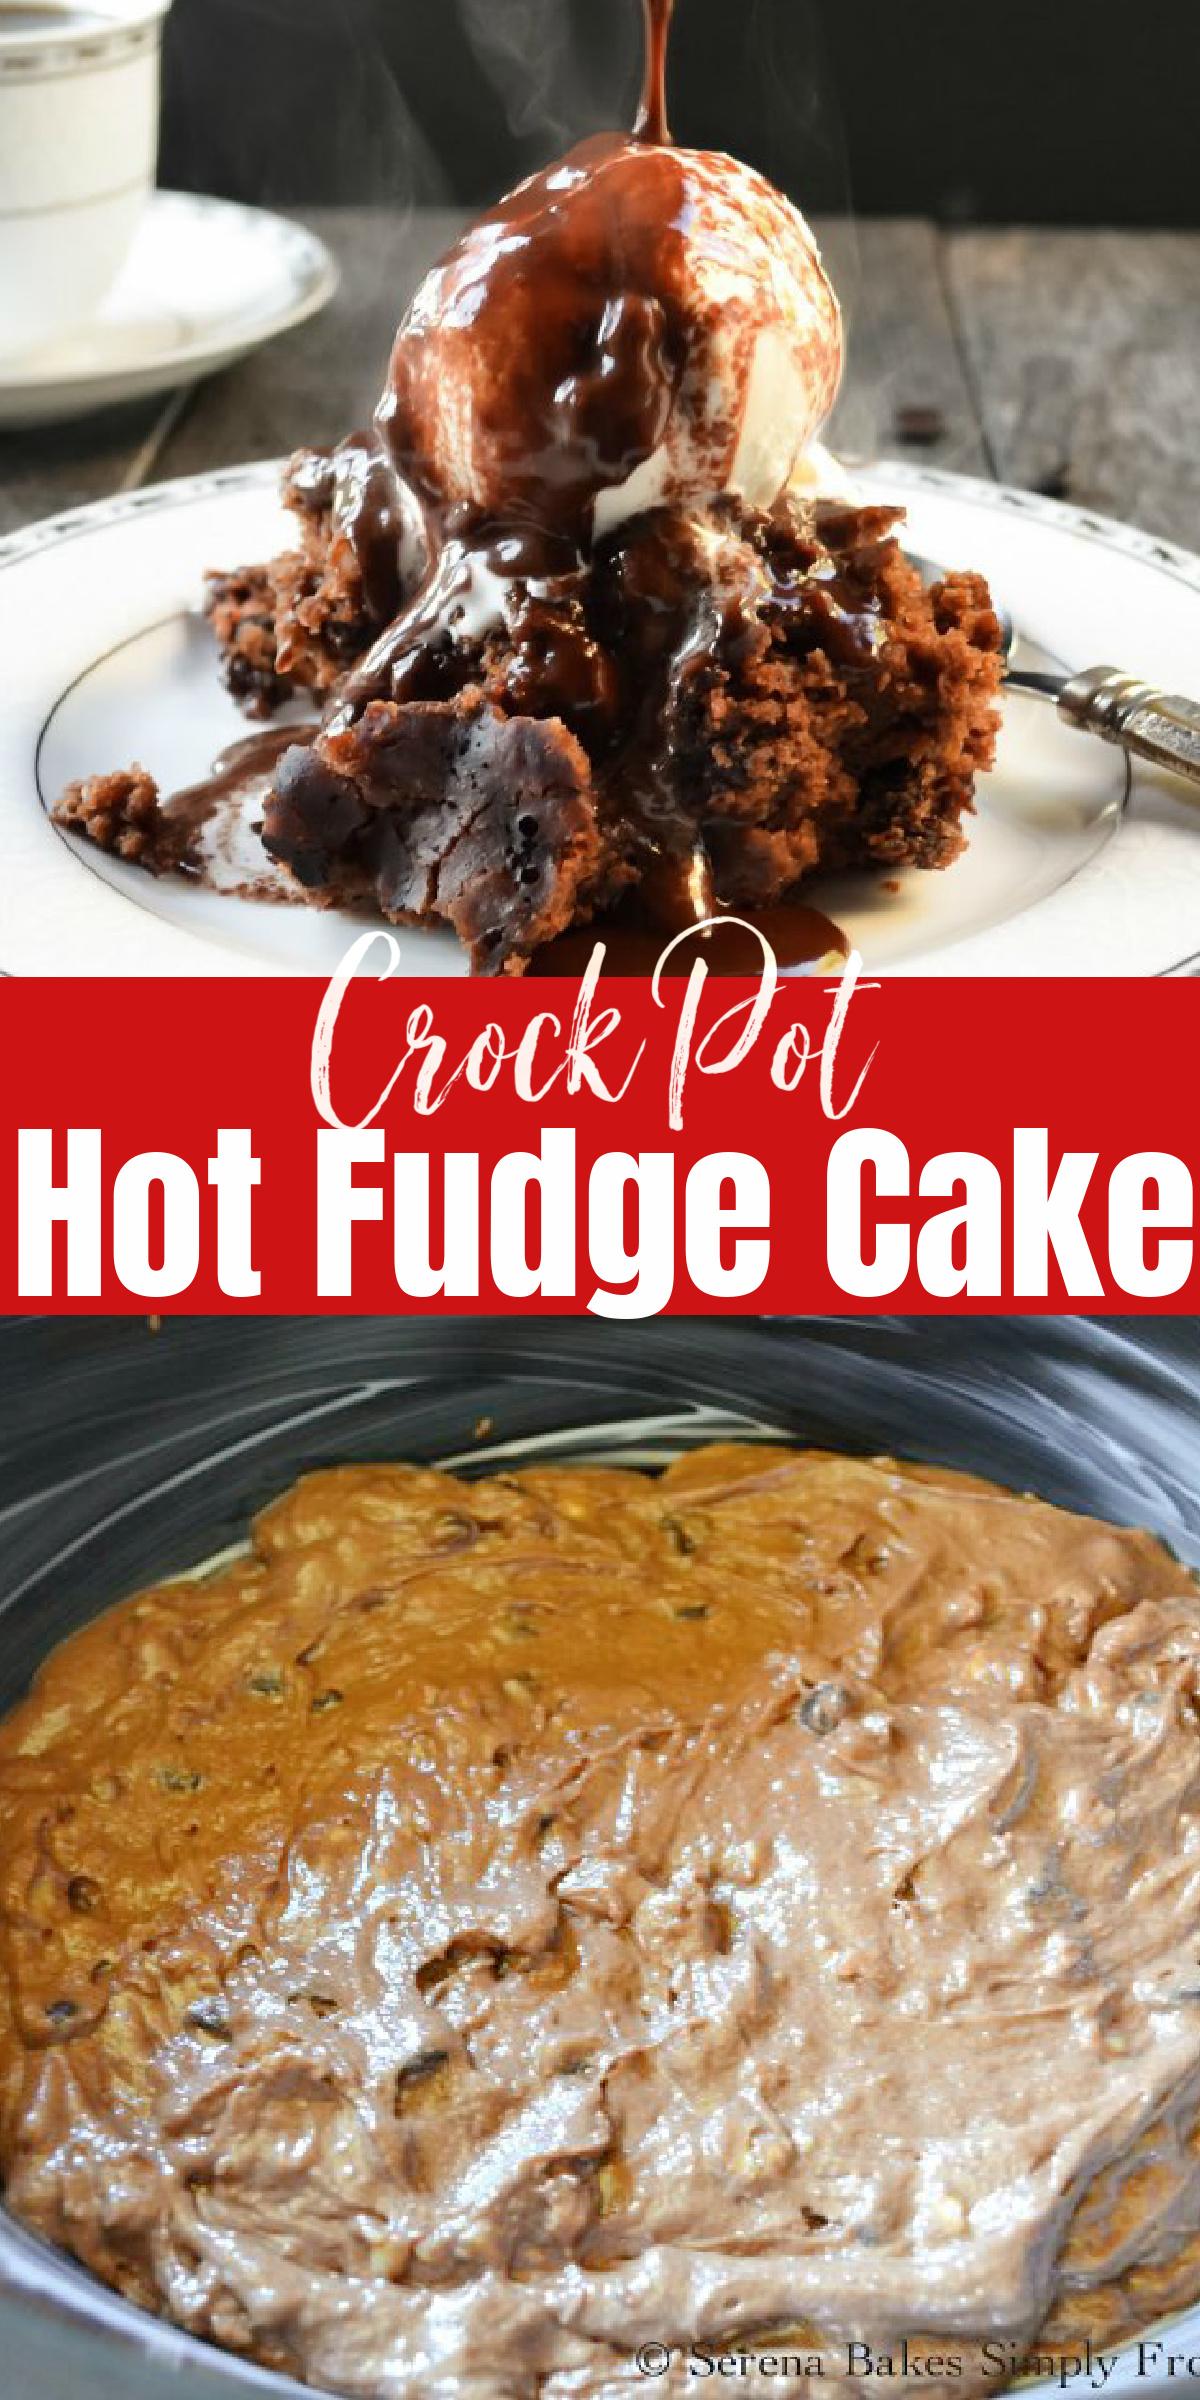 Easy to make Slow Cooker Hot Fudge Cake Recipe